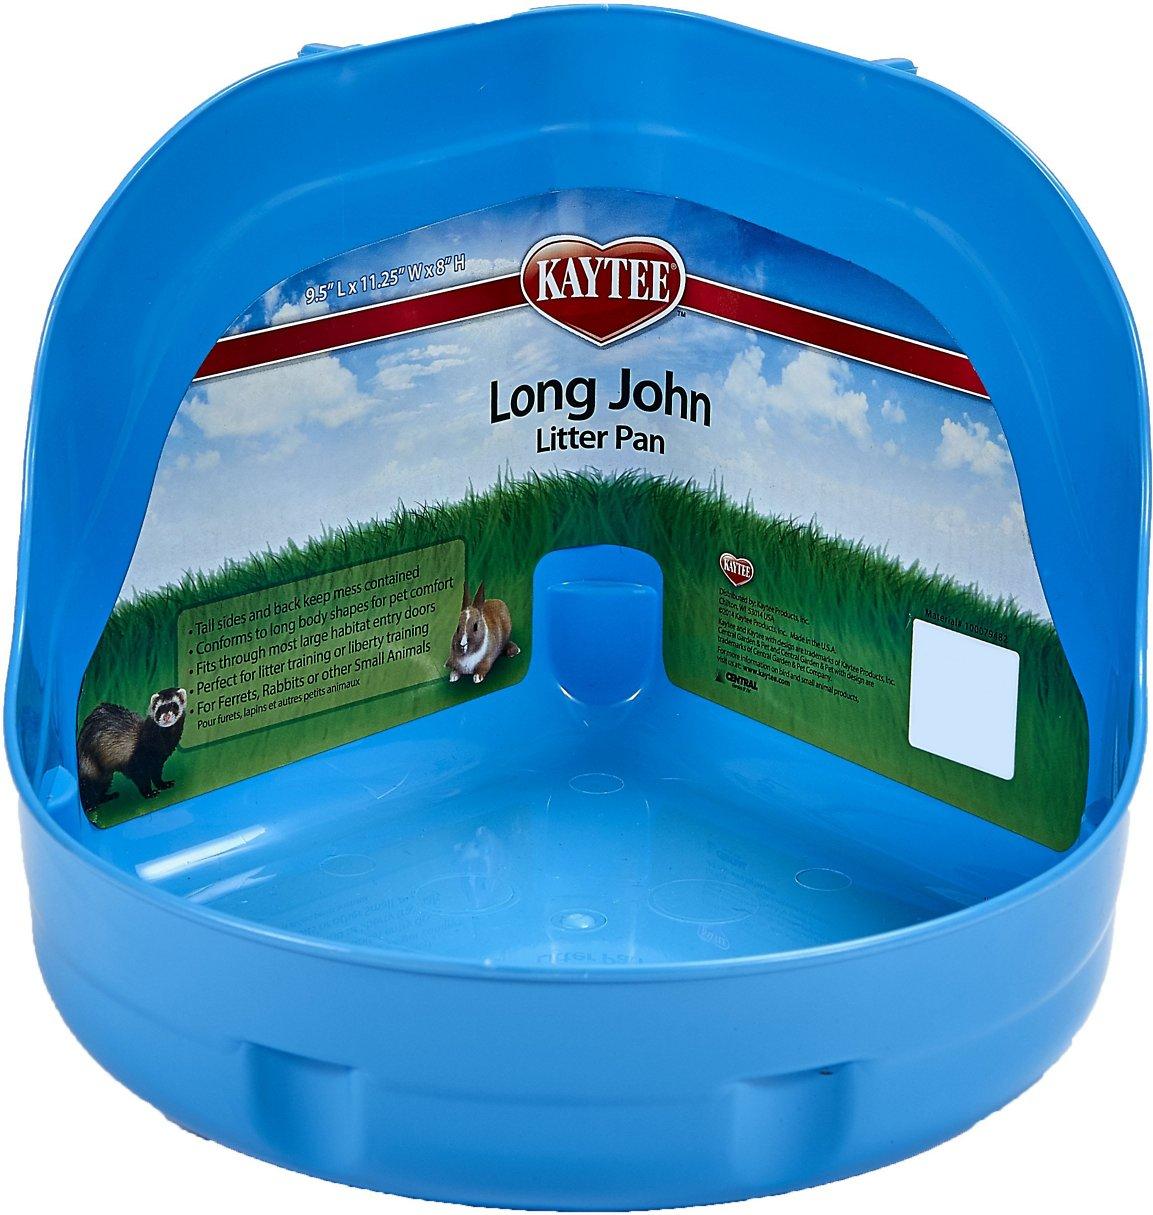 Kaytee Long John Small Pet Litter Pan, Color Varies